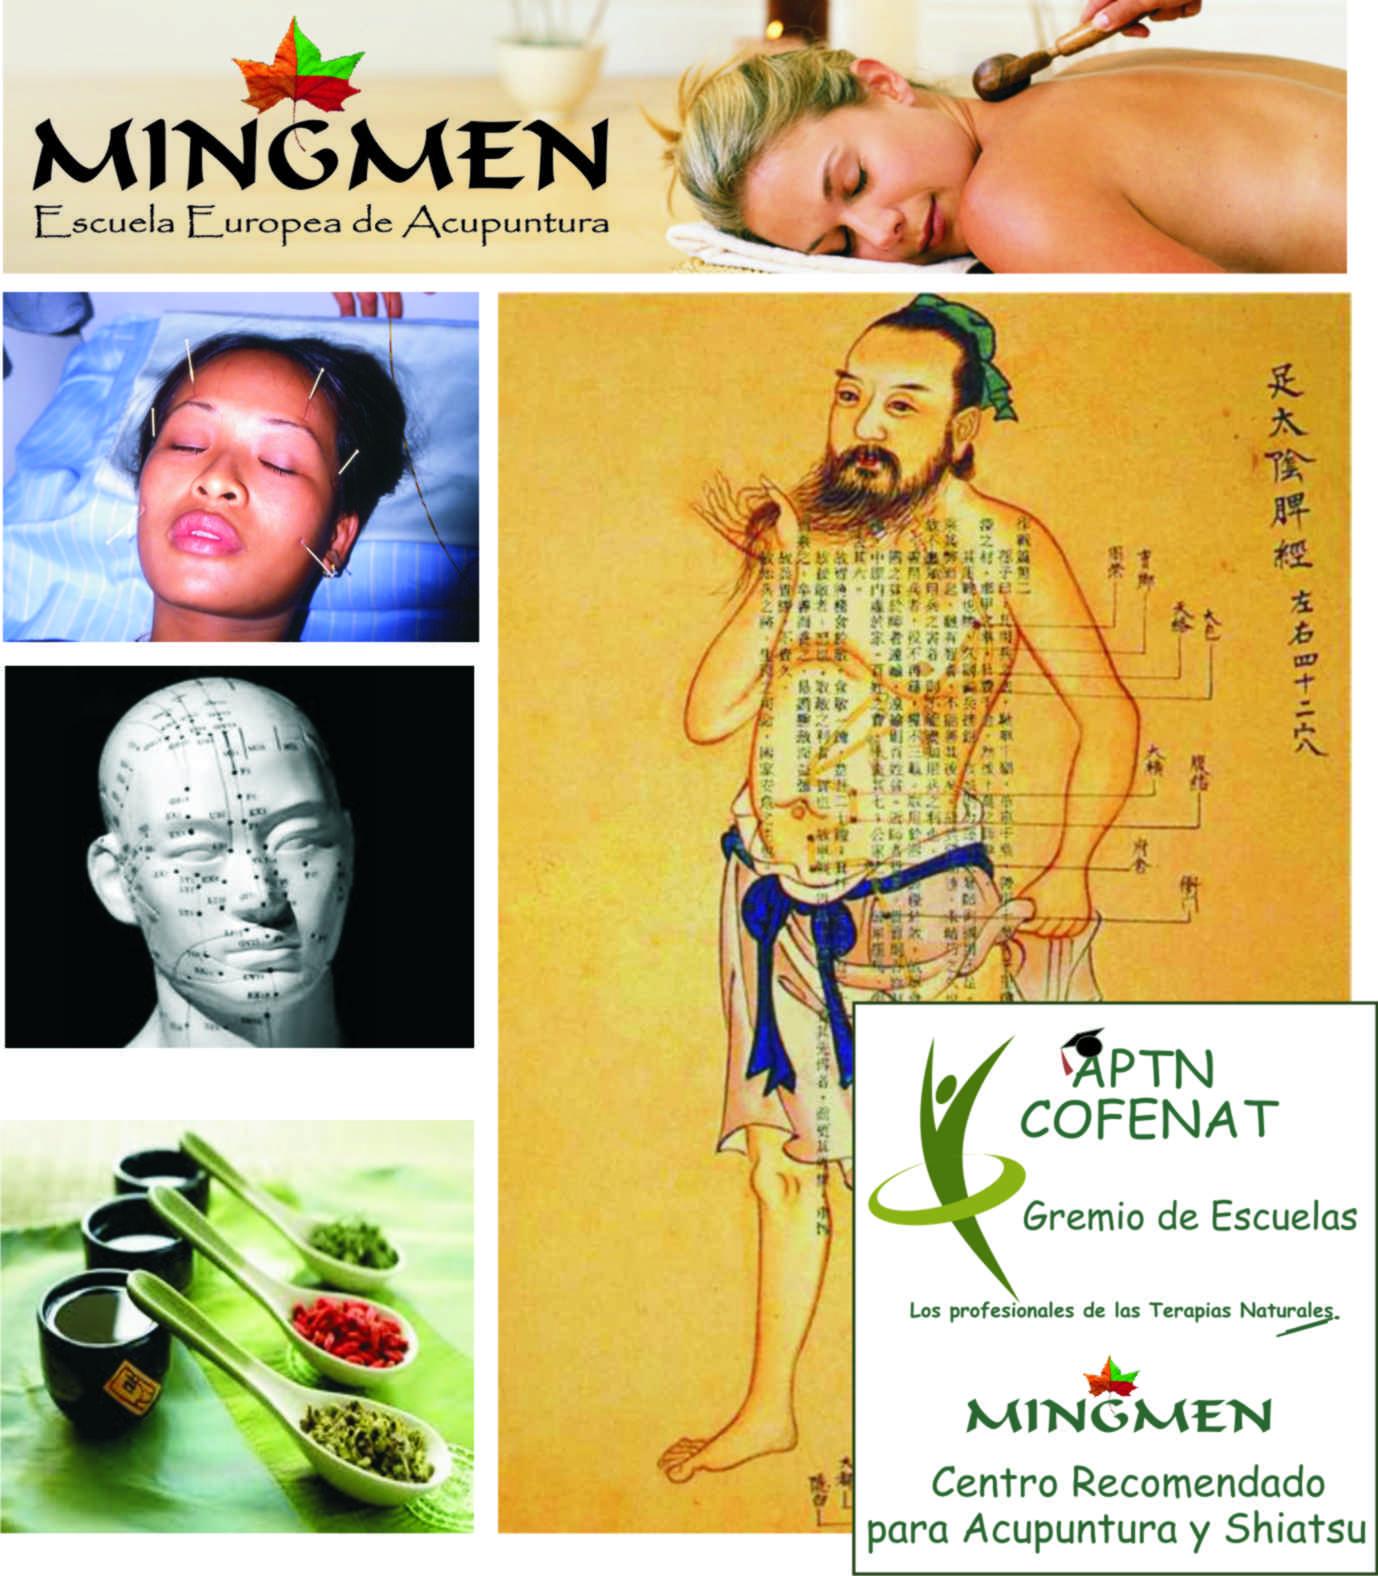 Escuela Europea de Acupuntura Mingmen